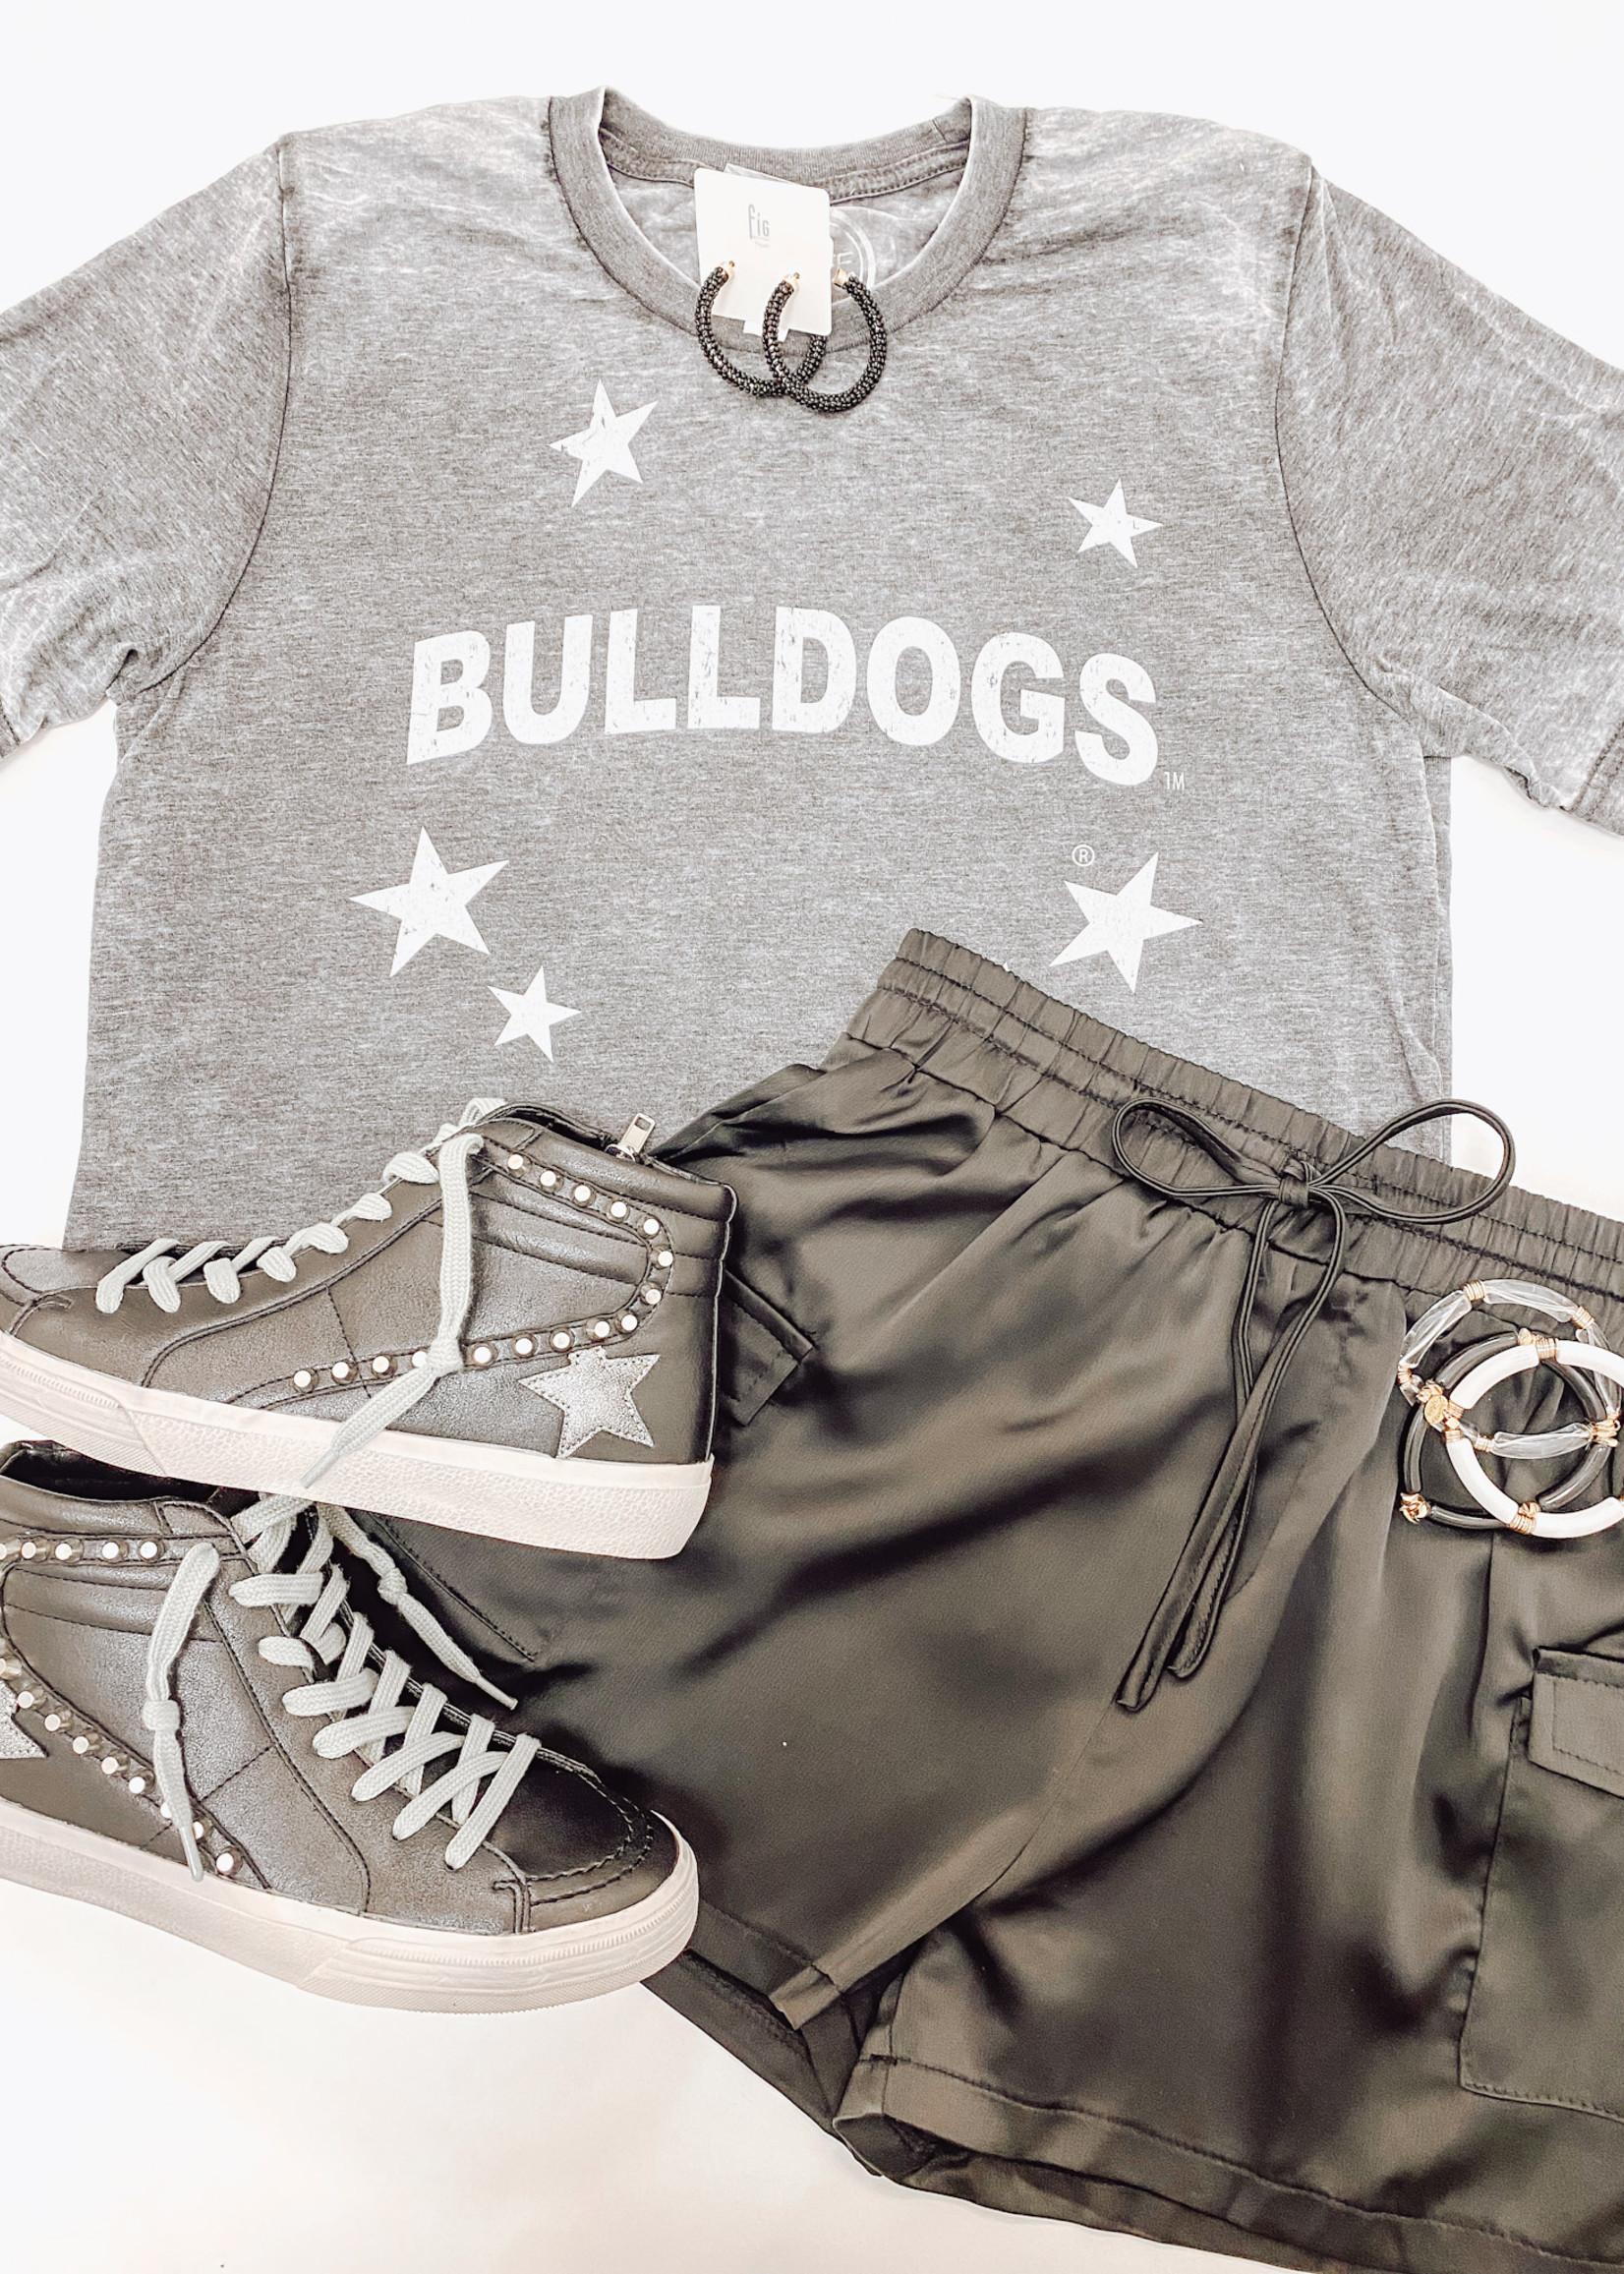 Bulldogs All-Star Acid Wash Tee